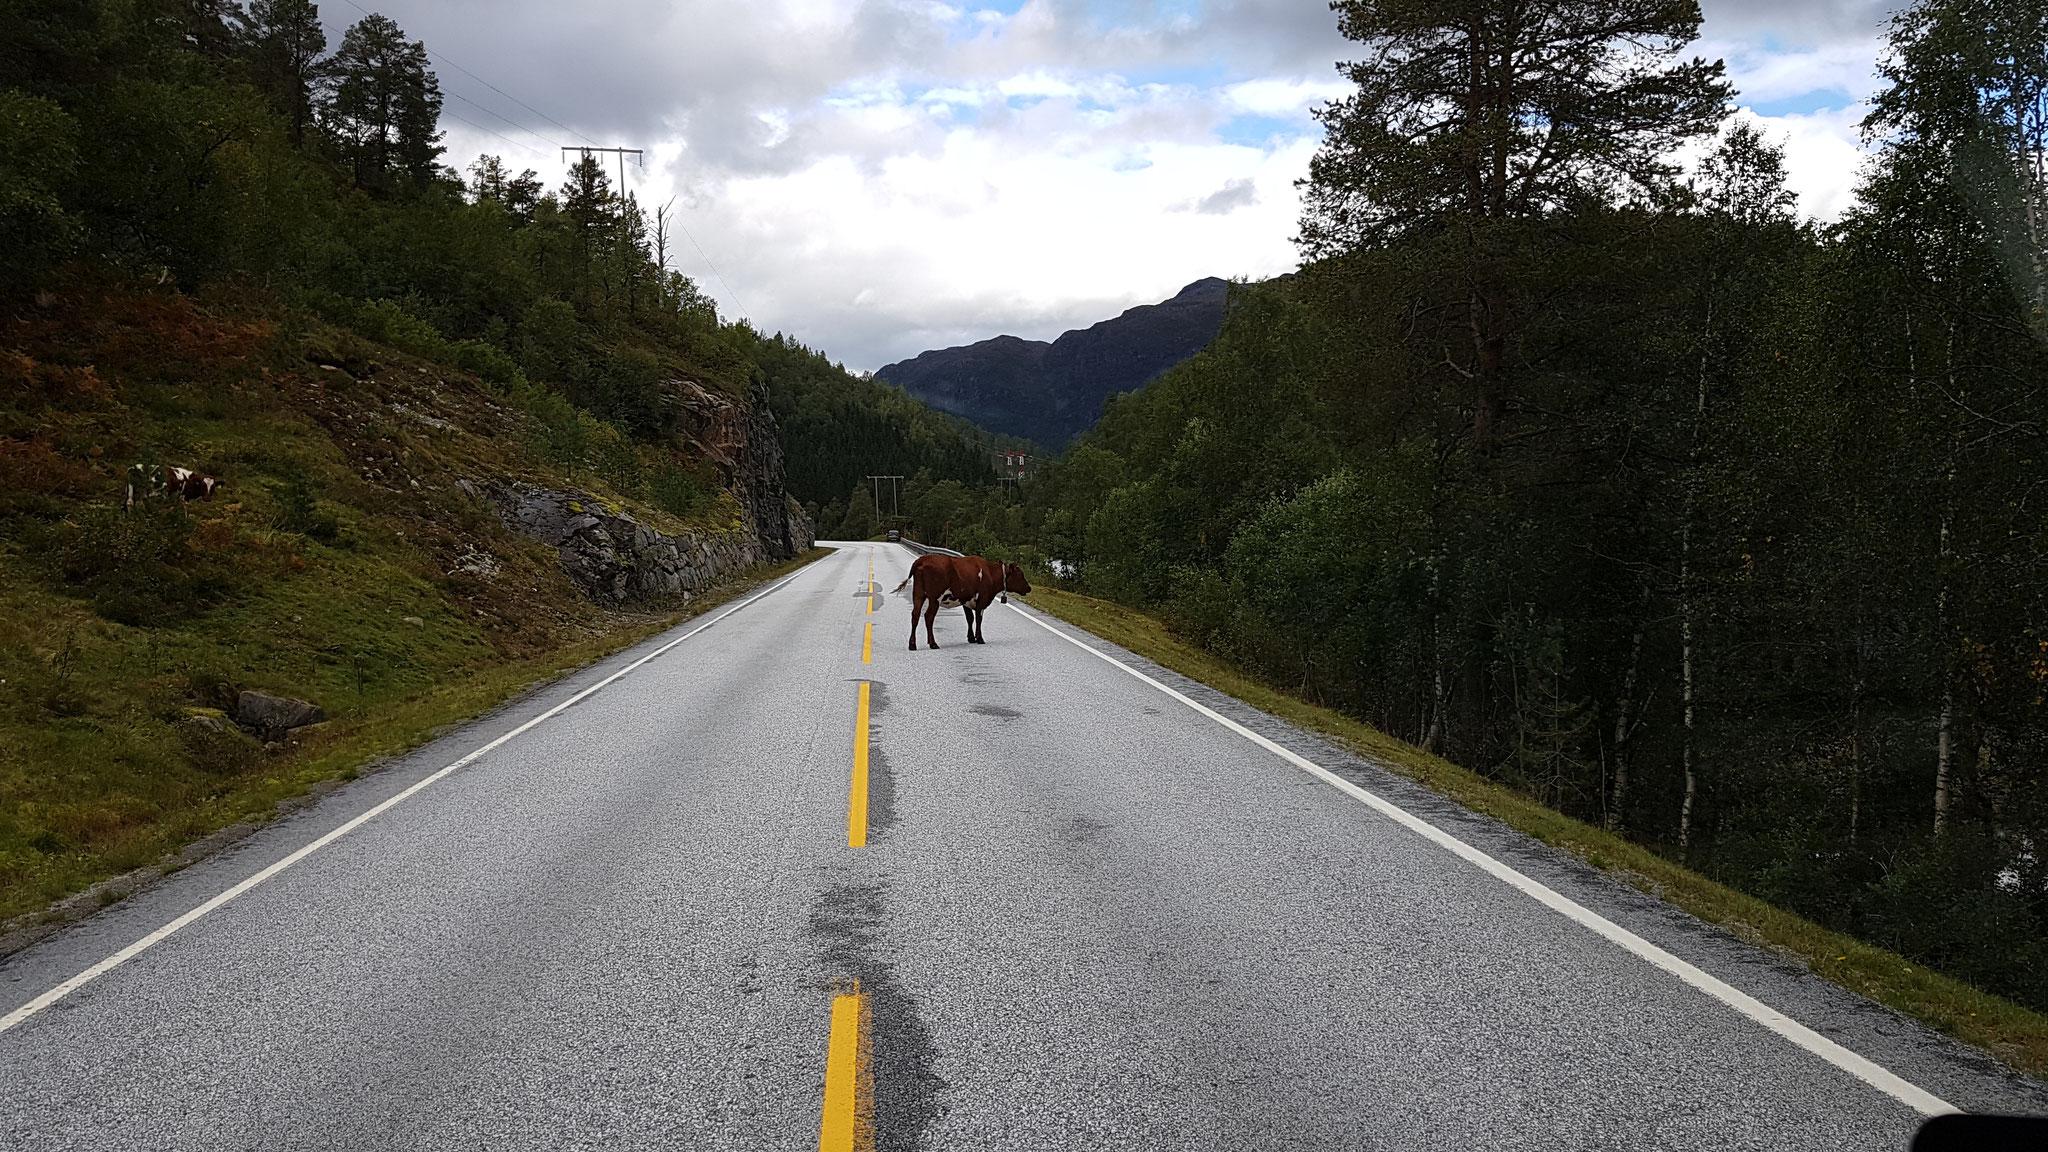 Noch mehr Kühe statt Elche :(